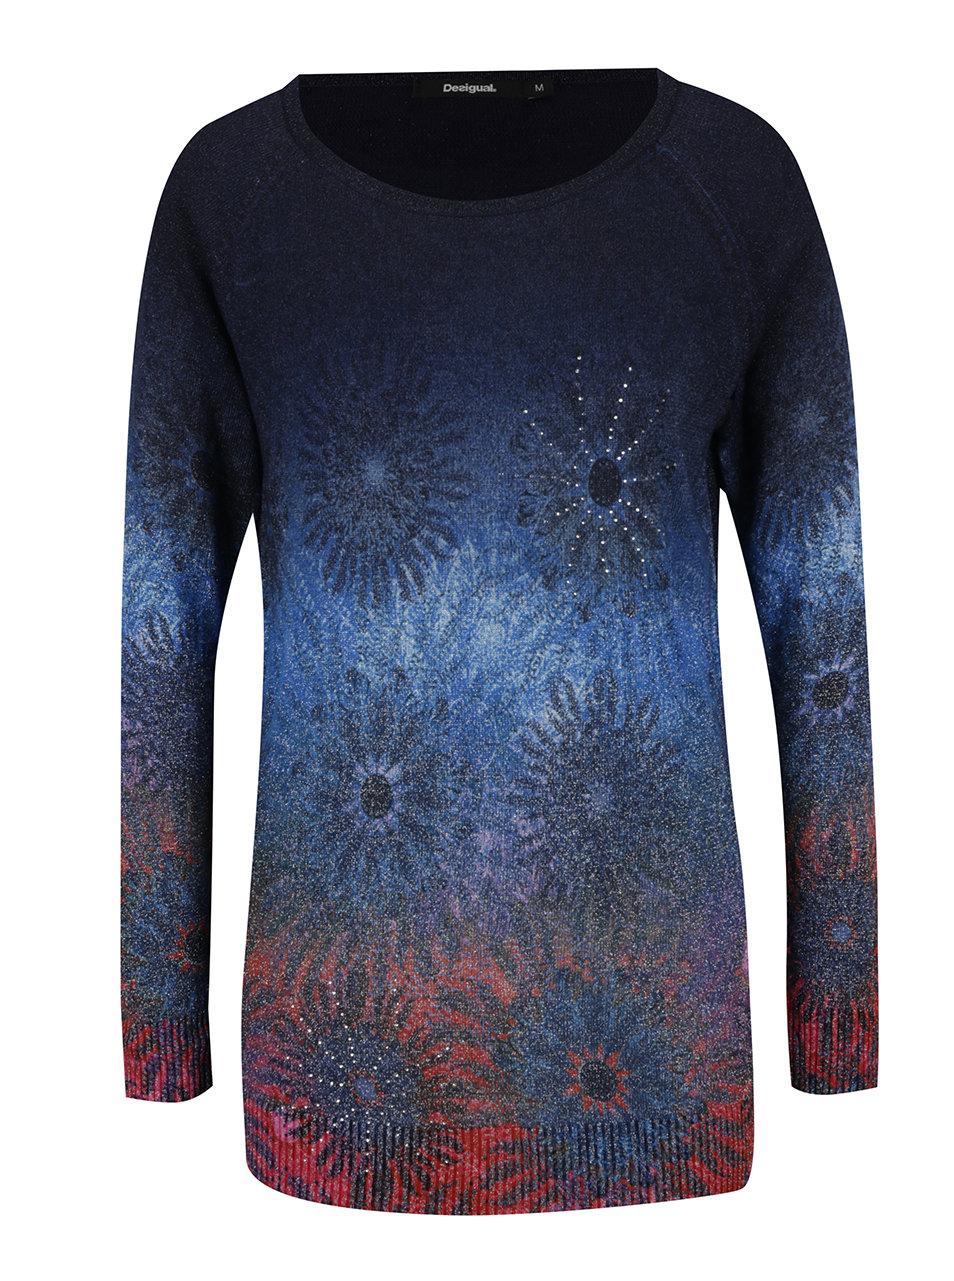 Tmavě modrý květovaný svetr Desigual Basic Carlin ... aa96e63d796